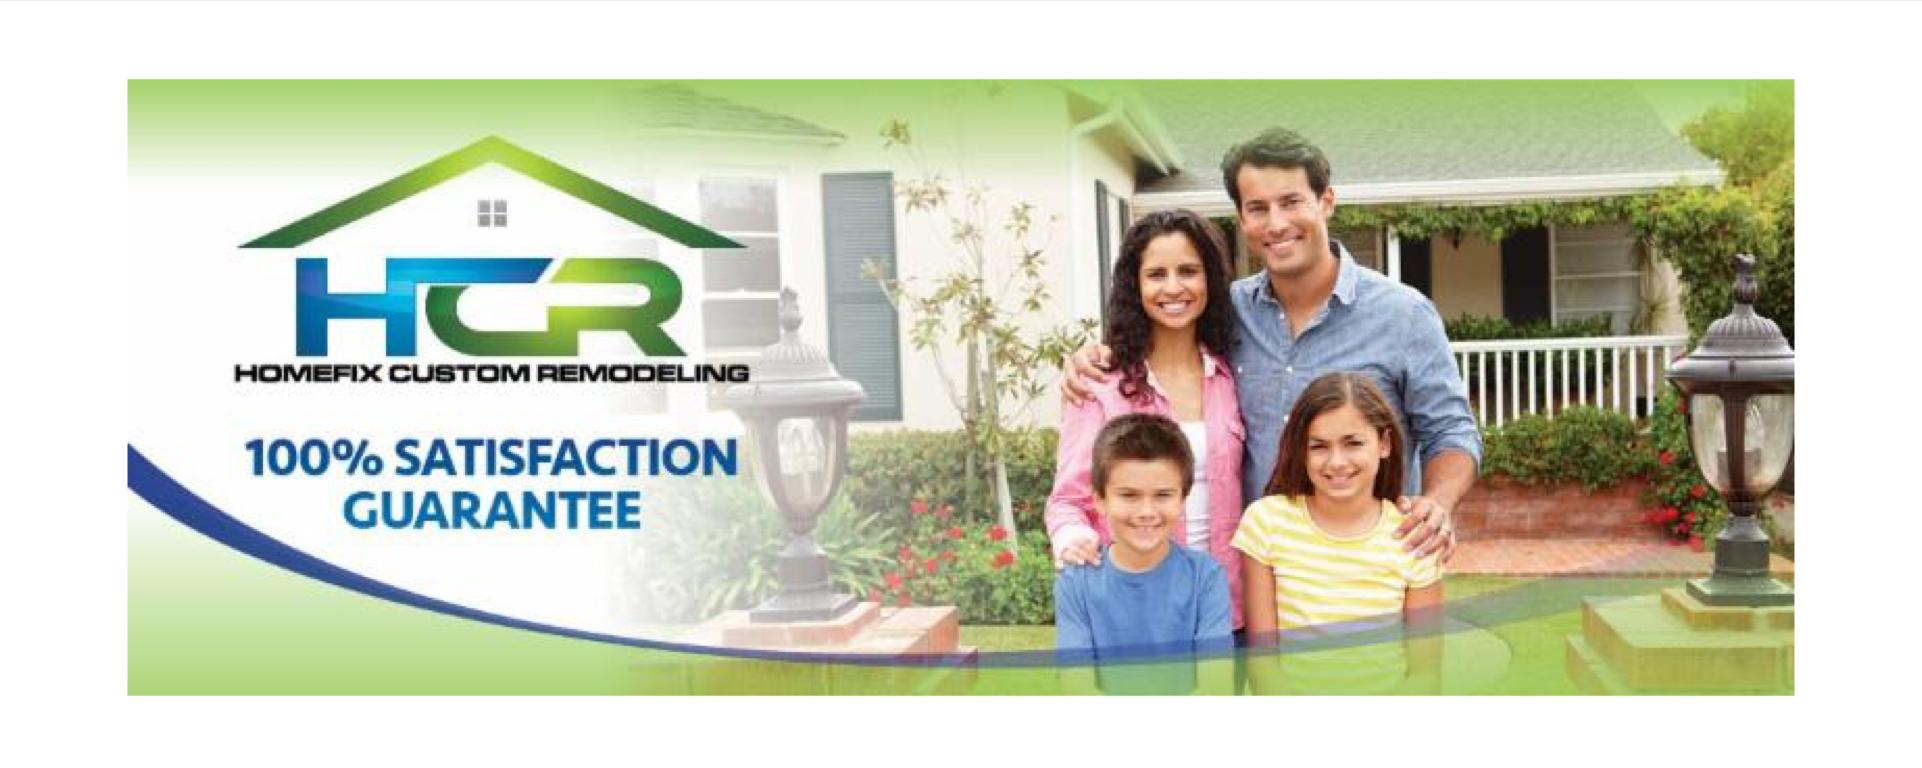 Homefix Custom Remodeling - Baltimore